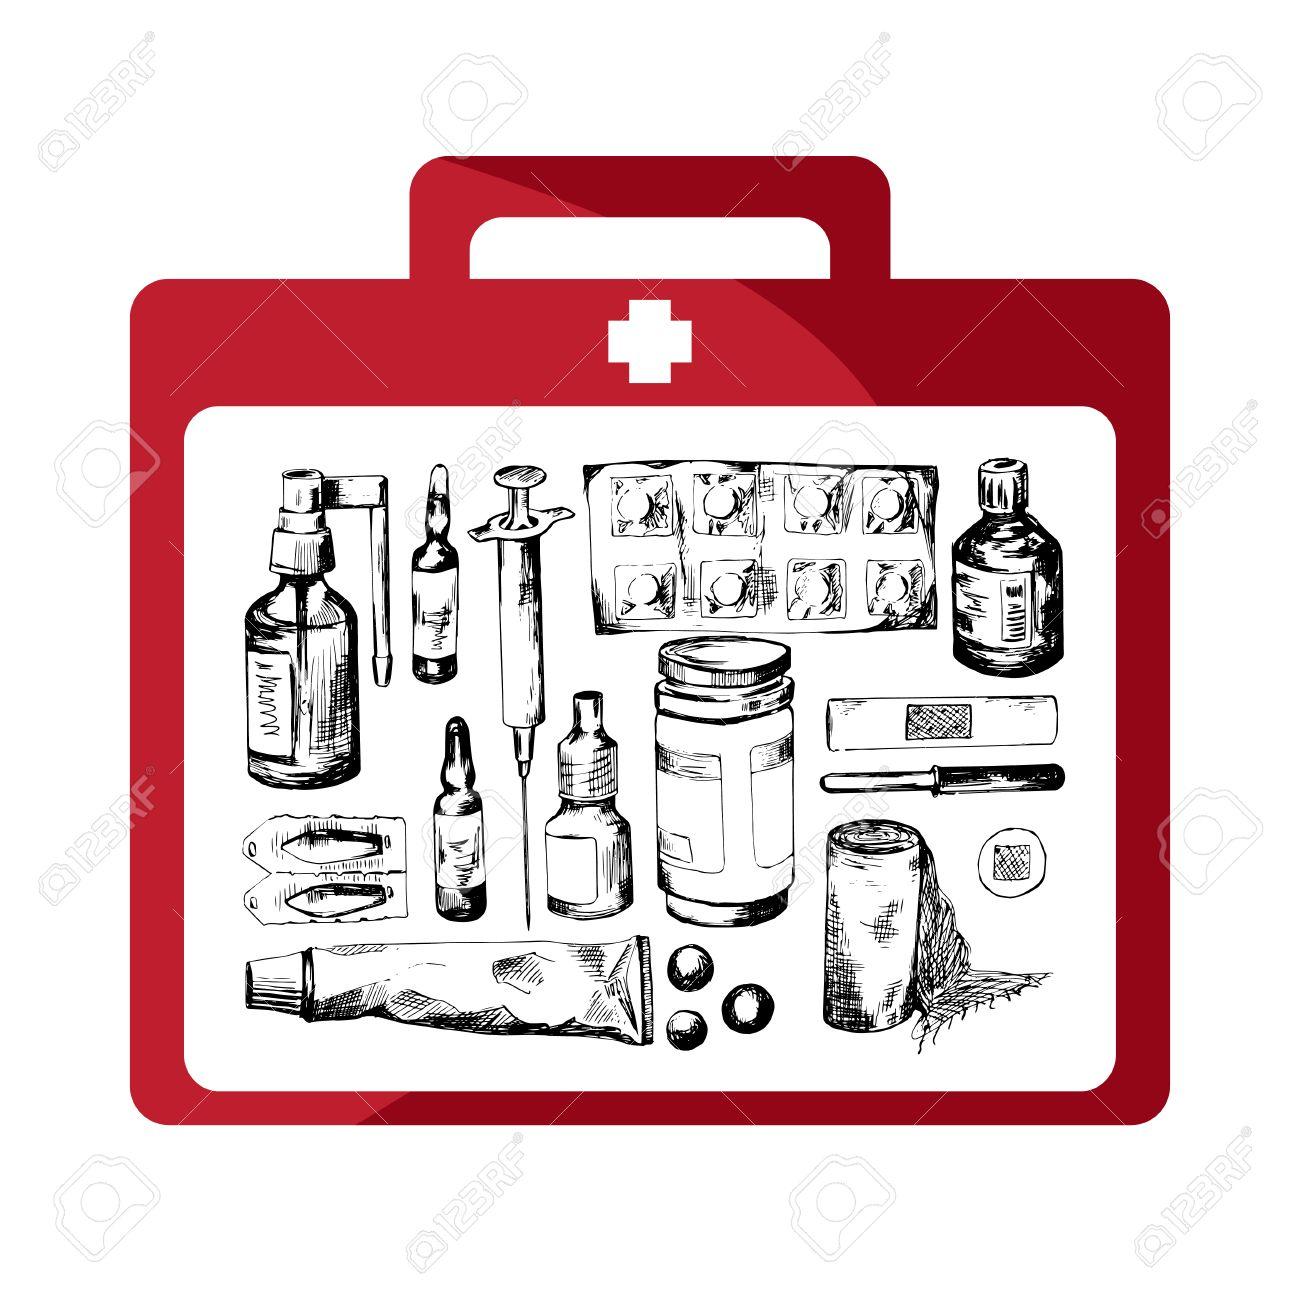 Iodine First Aid Clip Art